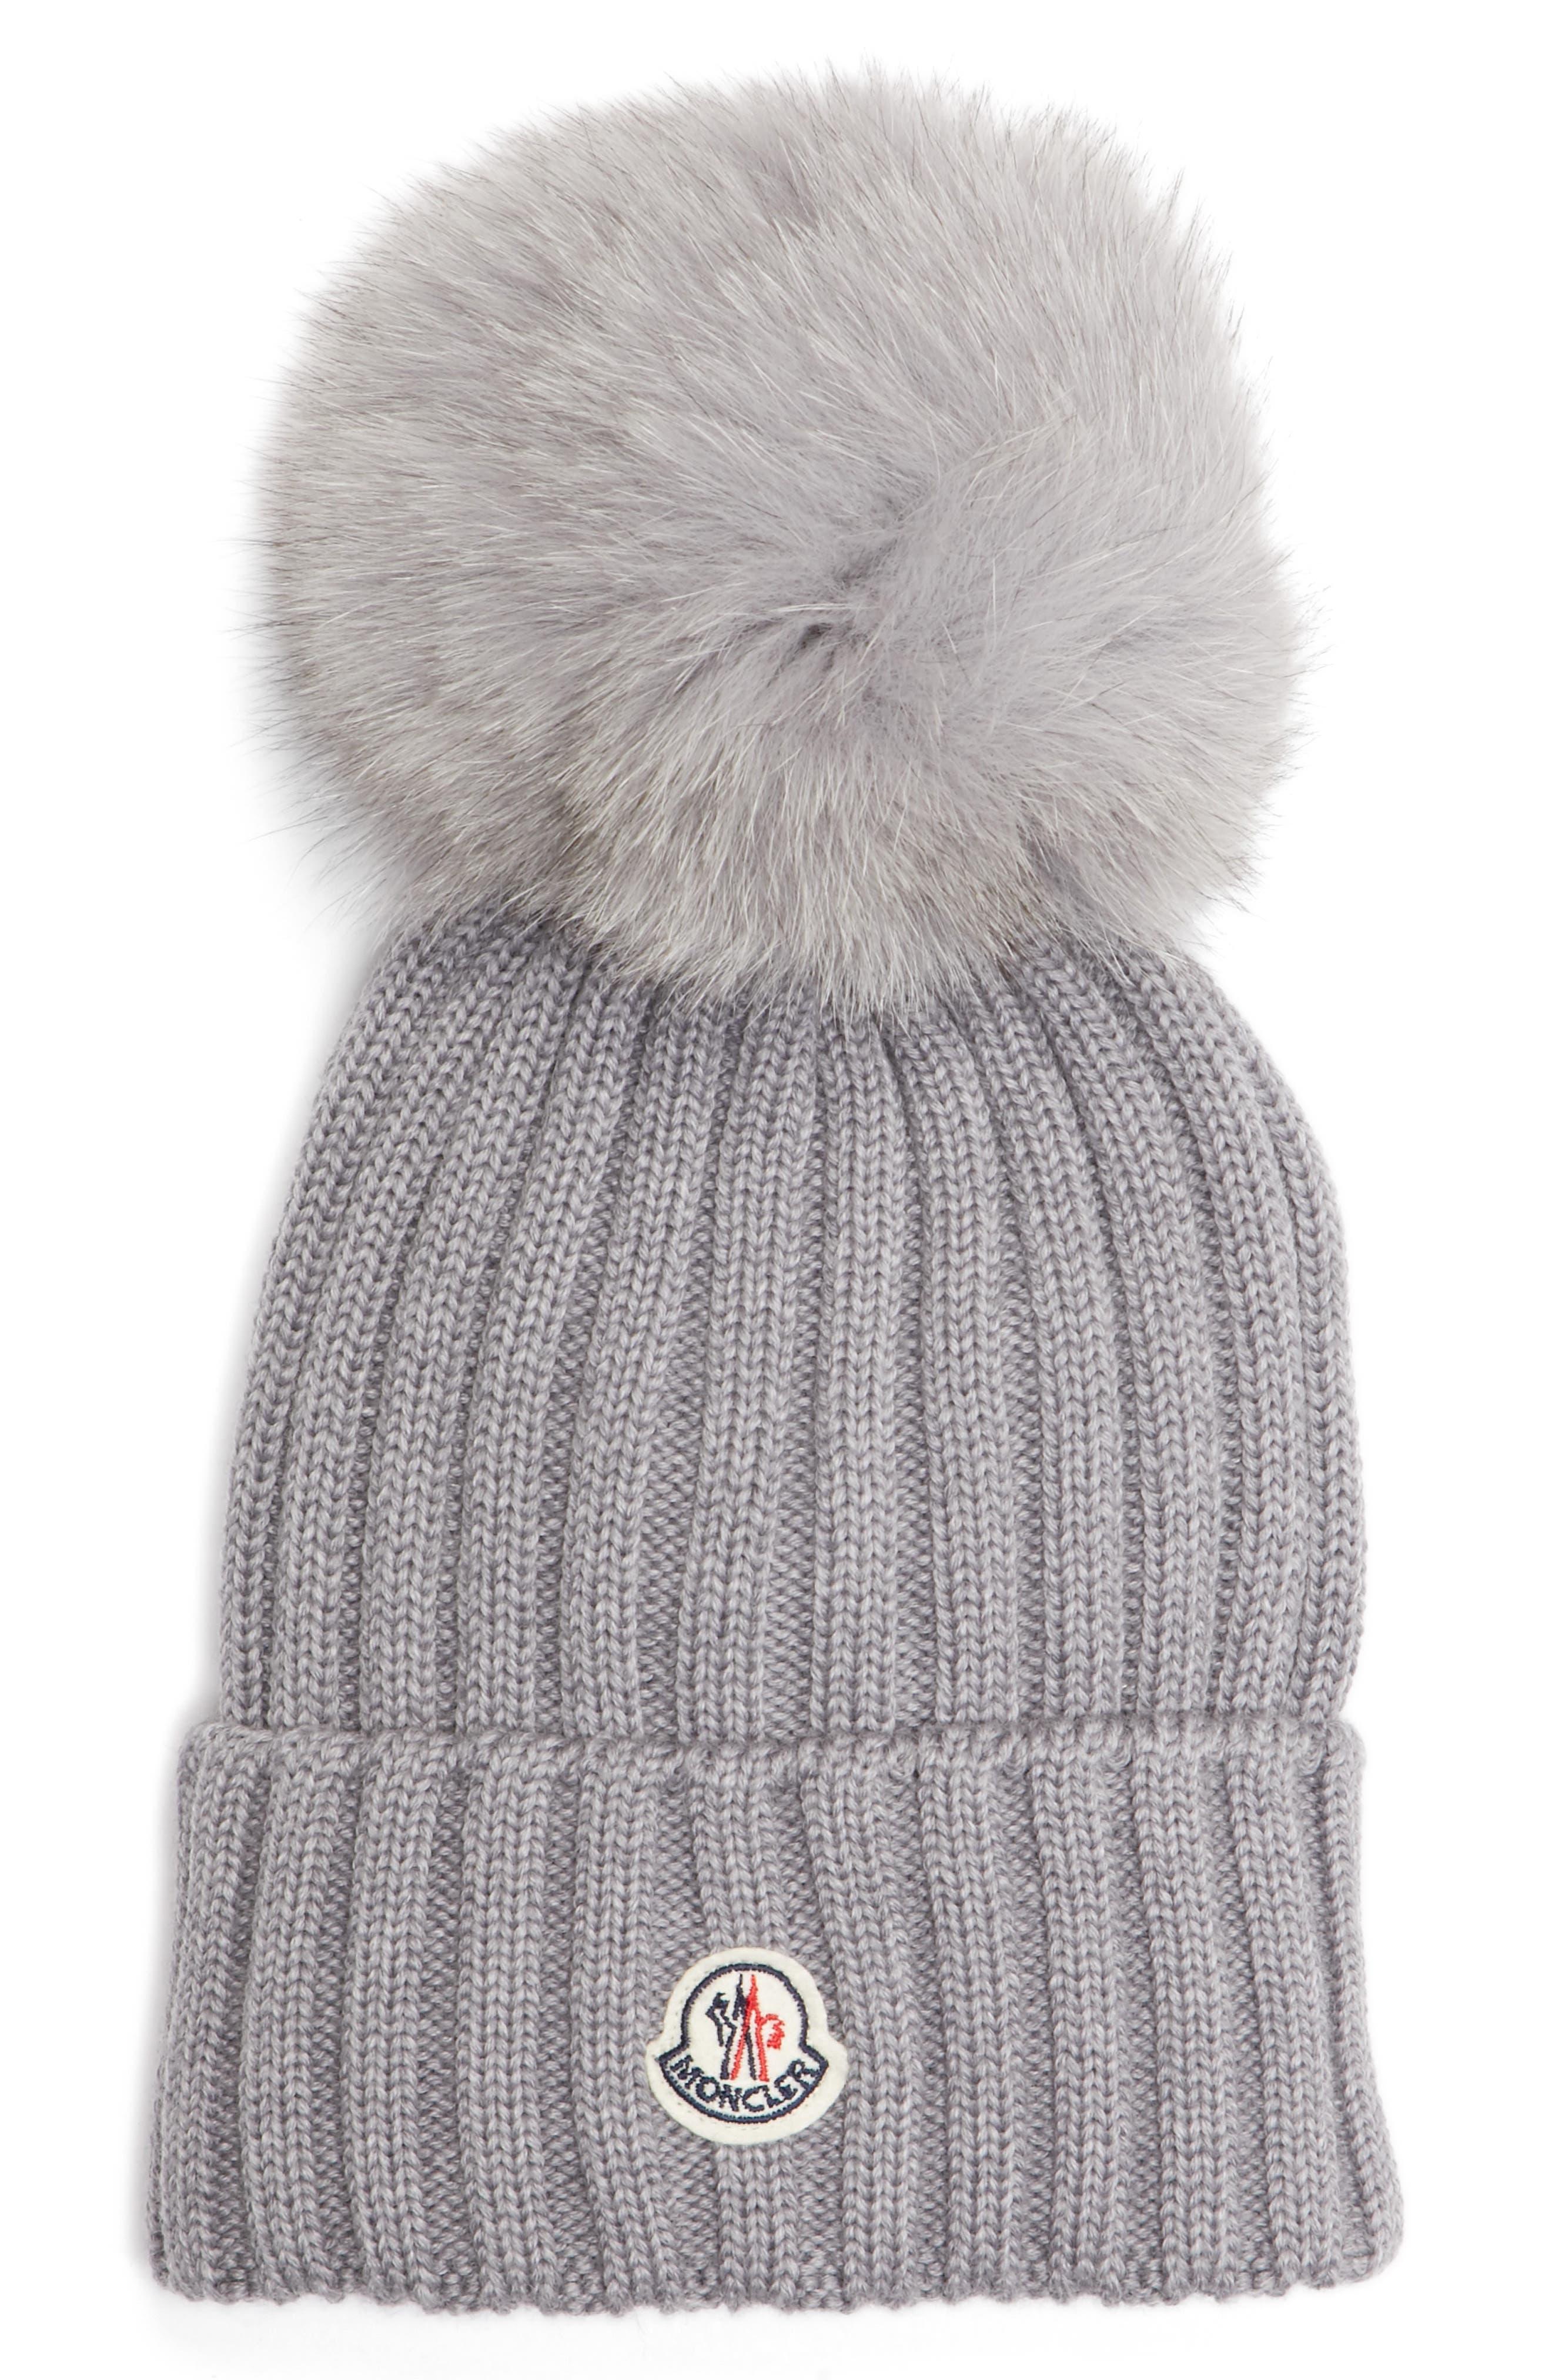 Alternate Image 1 Selected - Moncler Genuine Fox Fur Pom Ribbed Wool Beanie